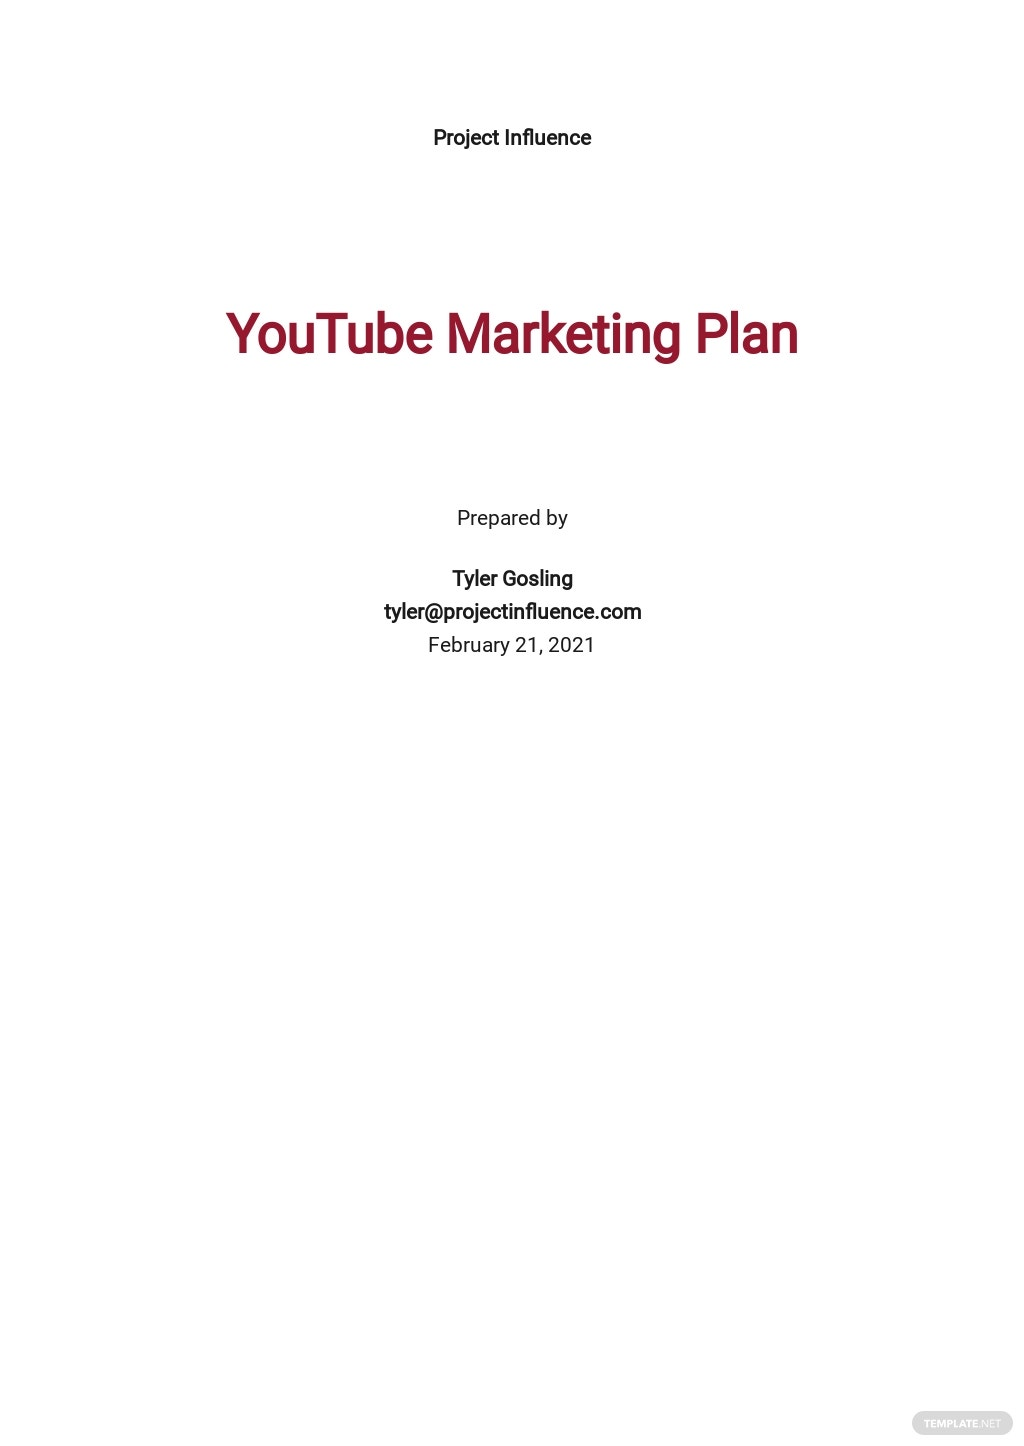 YouTube Marketing Plan Template